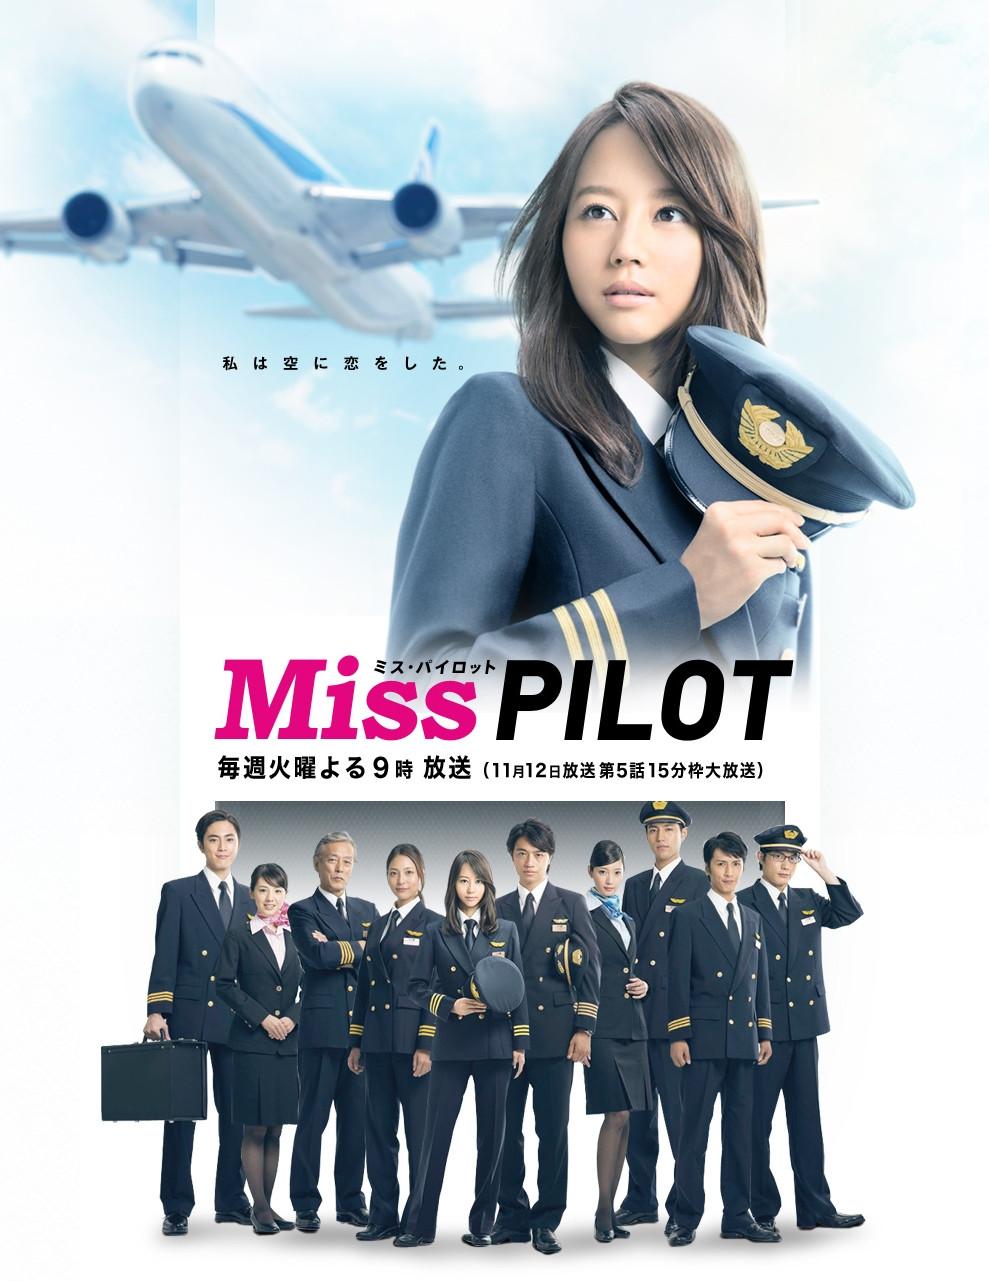 Miss Pilot kapak